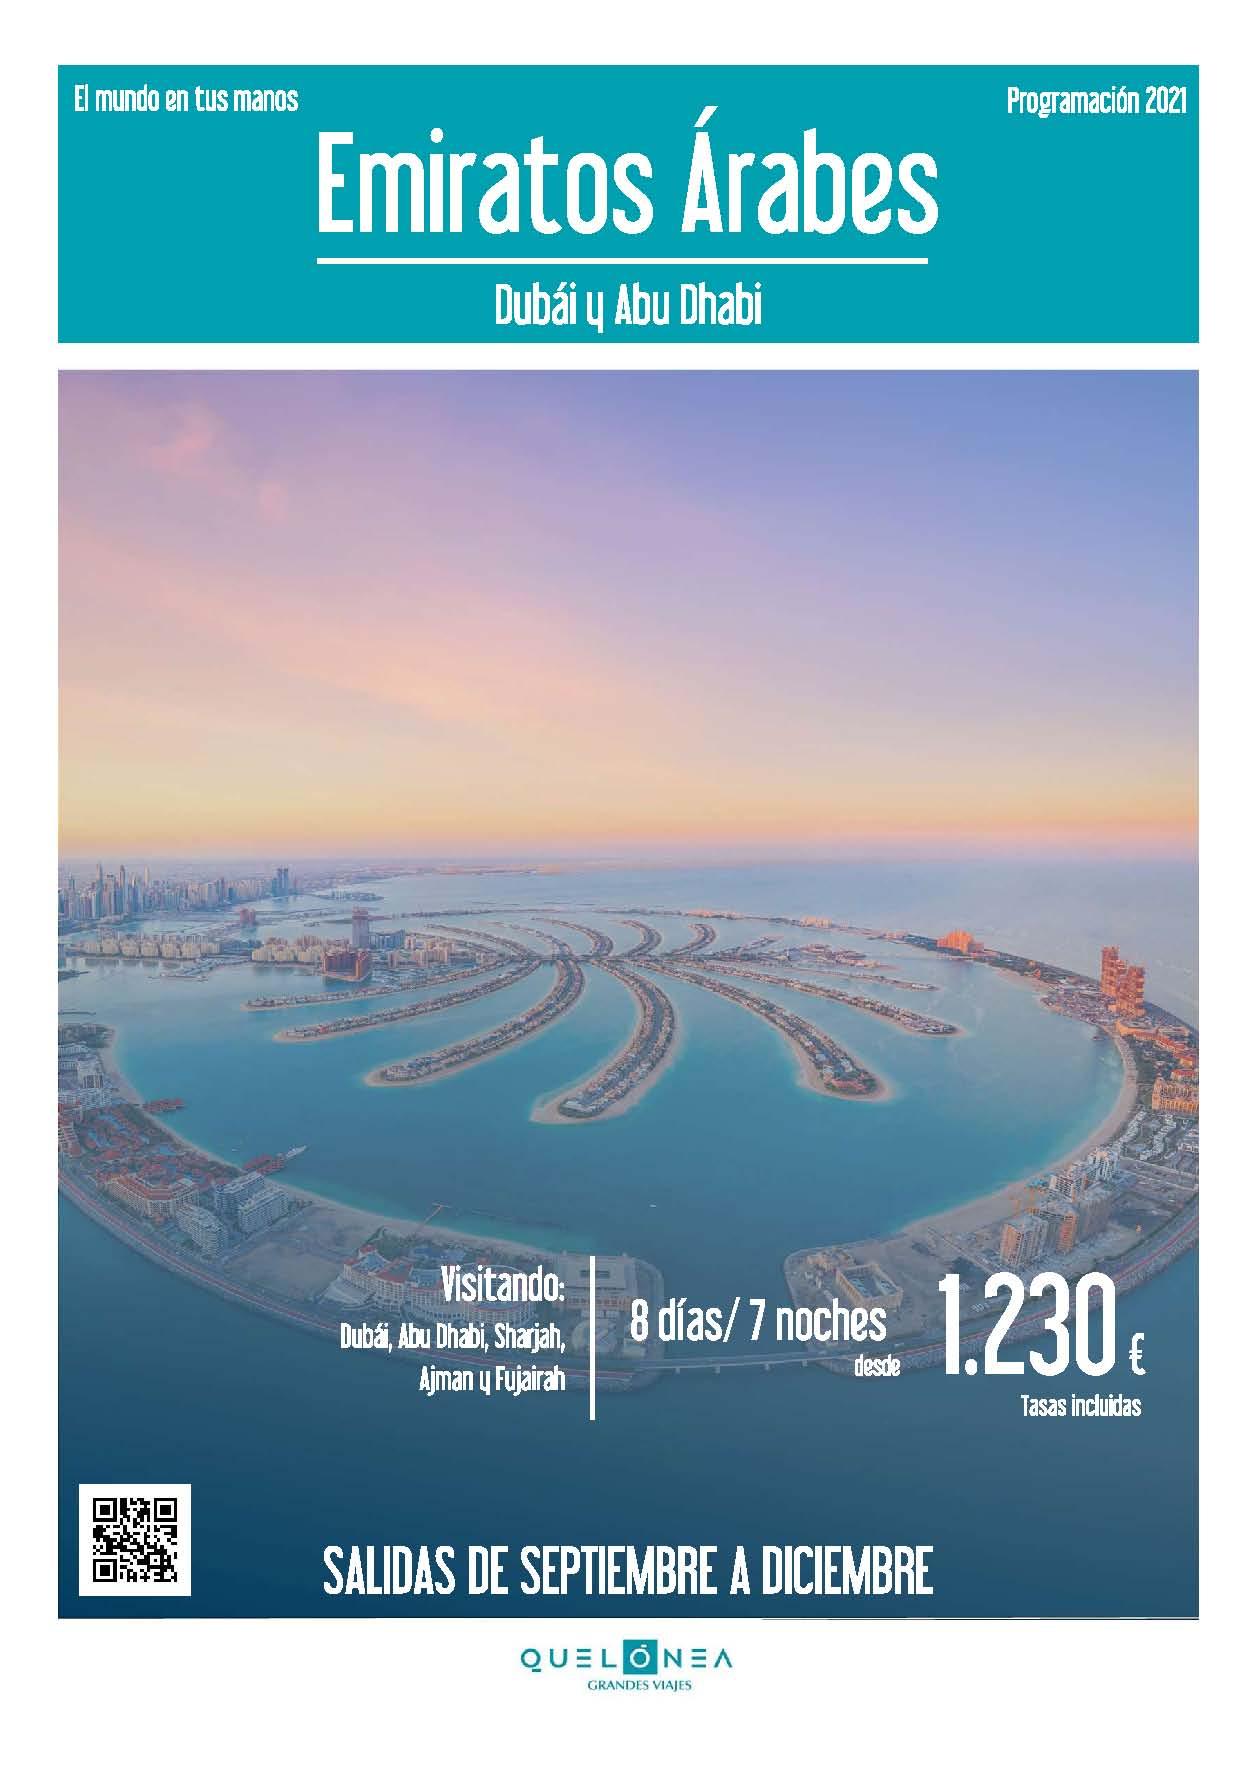 Ofertas Quelonea Emiratos Arabes 2021 vuelo directo desde Madrid